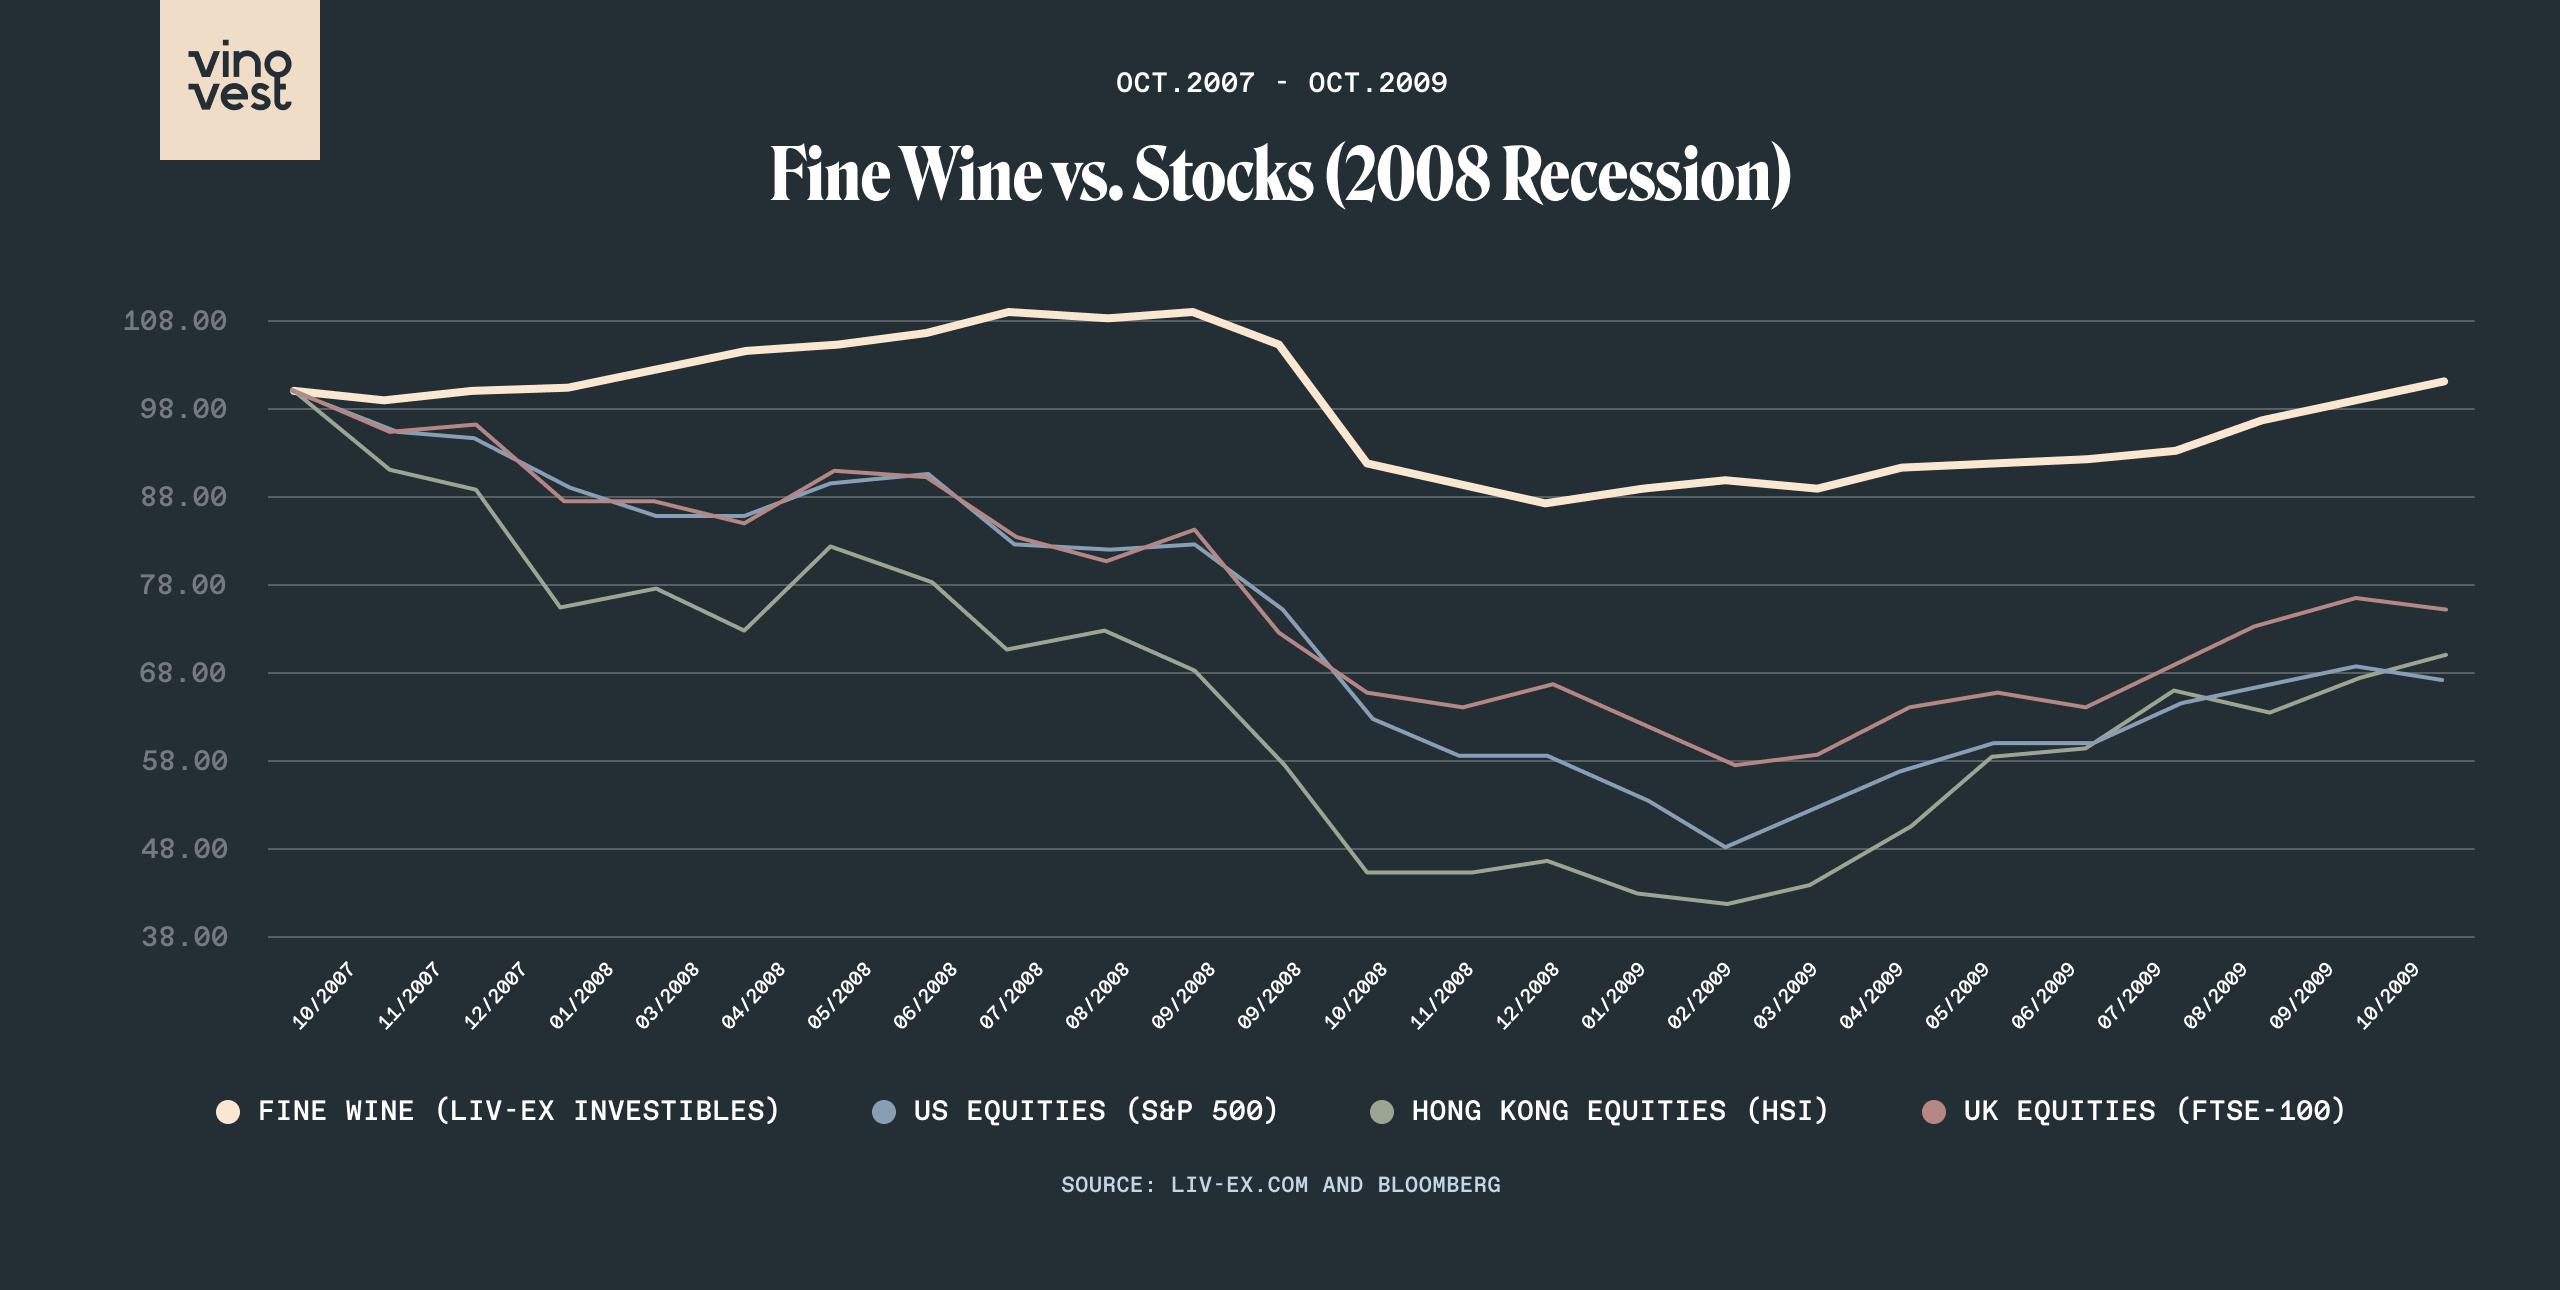 Fine Wine investments versus stocks since 2008